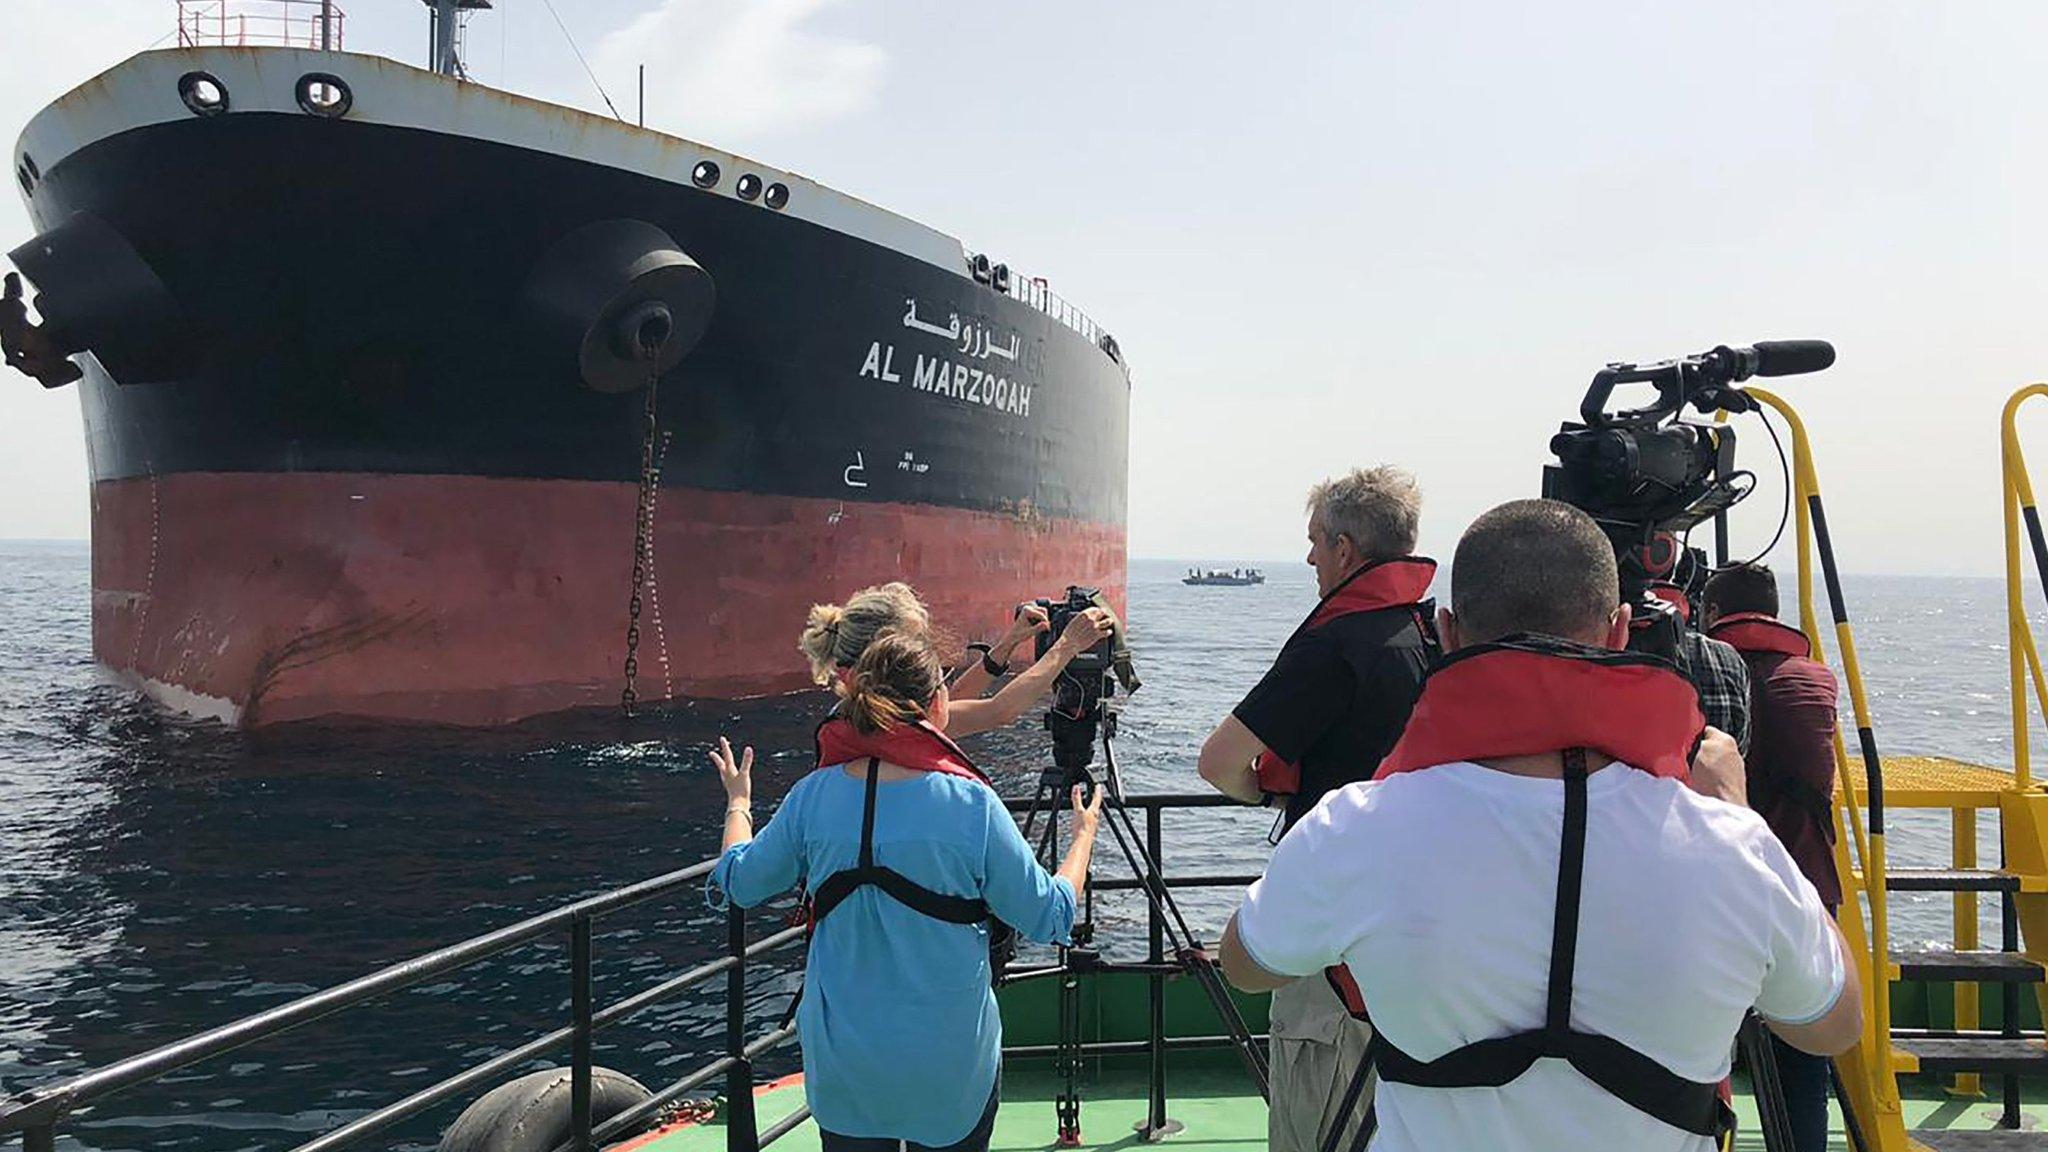 Saudi Arabia says two oil tankers attacked near UAE